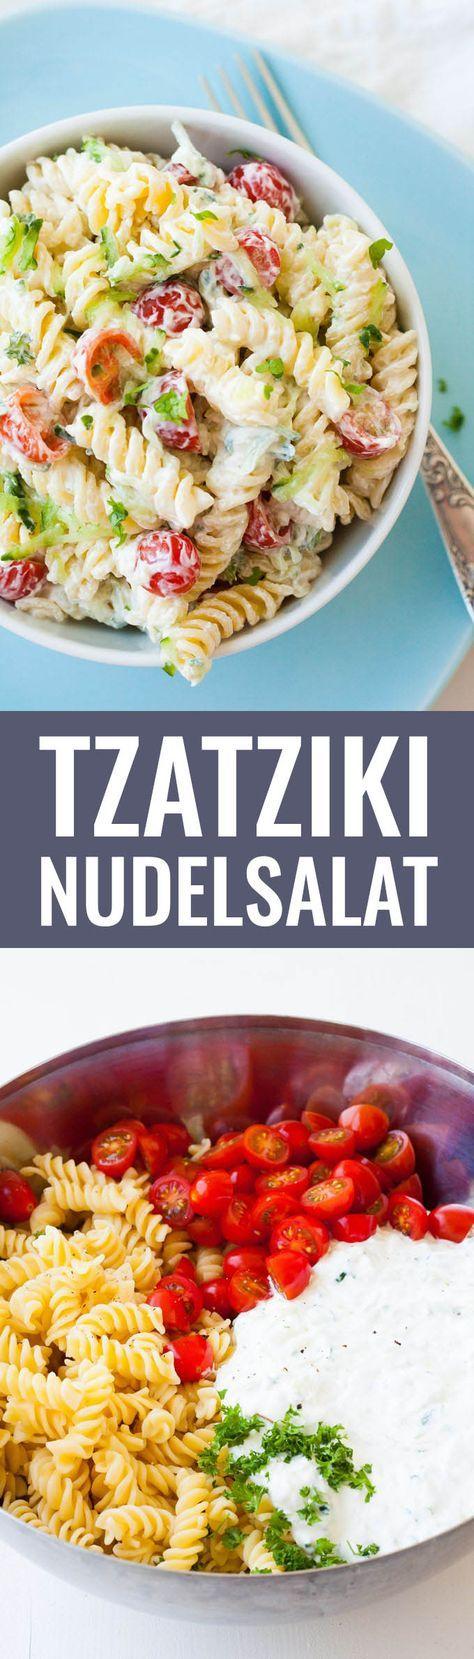 20 minuten tzatziki nudelsalat recipe culinary pinterest tzatziki food and pasta